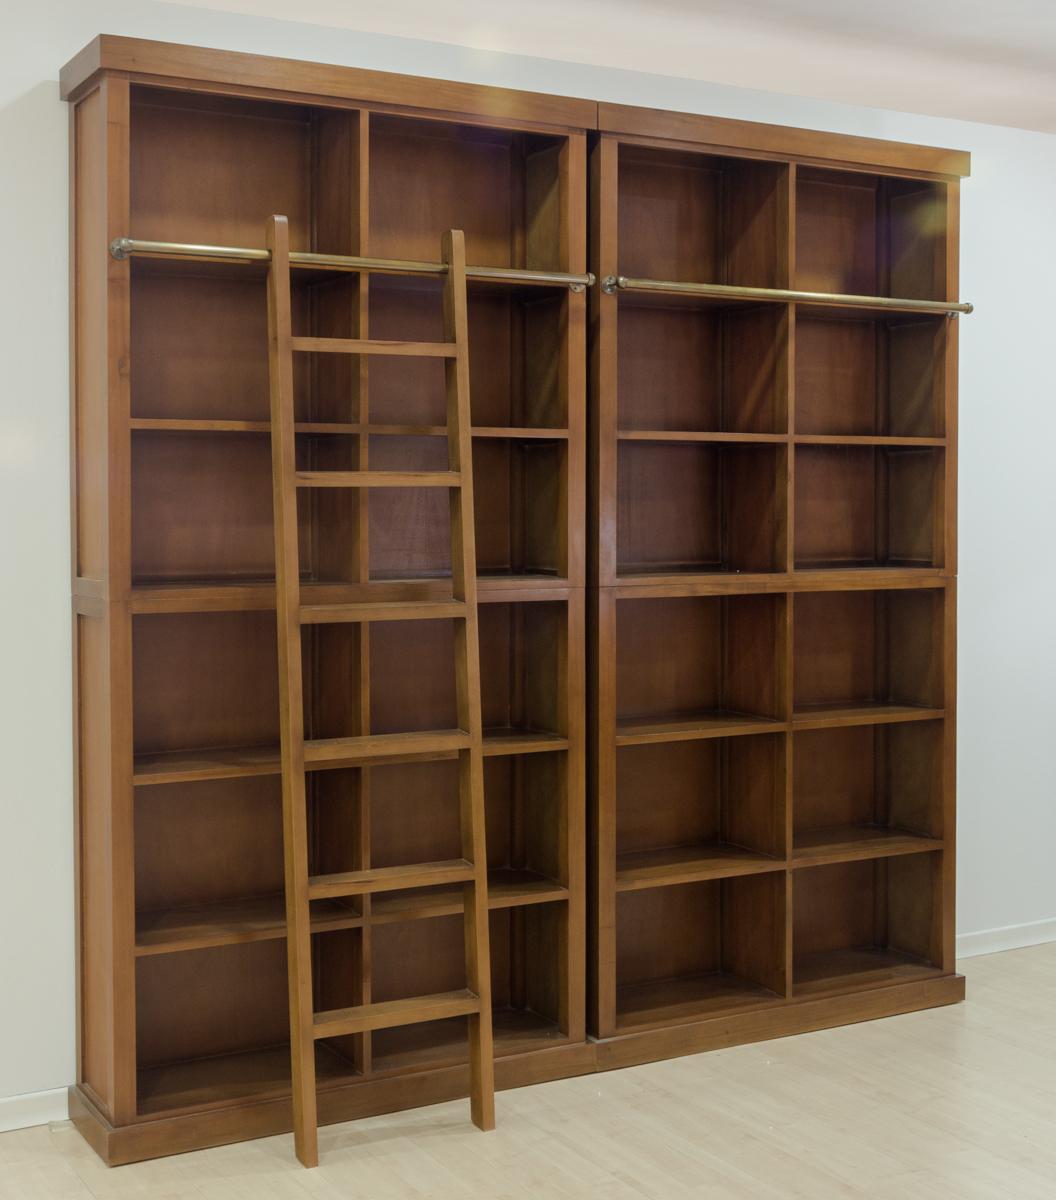 Librer a cl sica de madera maciza con escalera decorativa for Escalera libreria